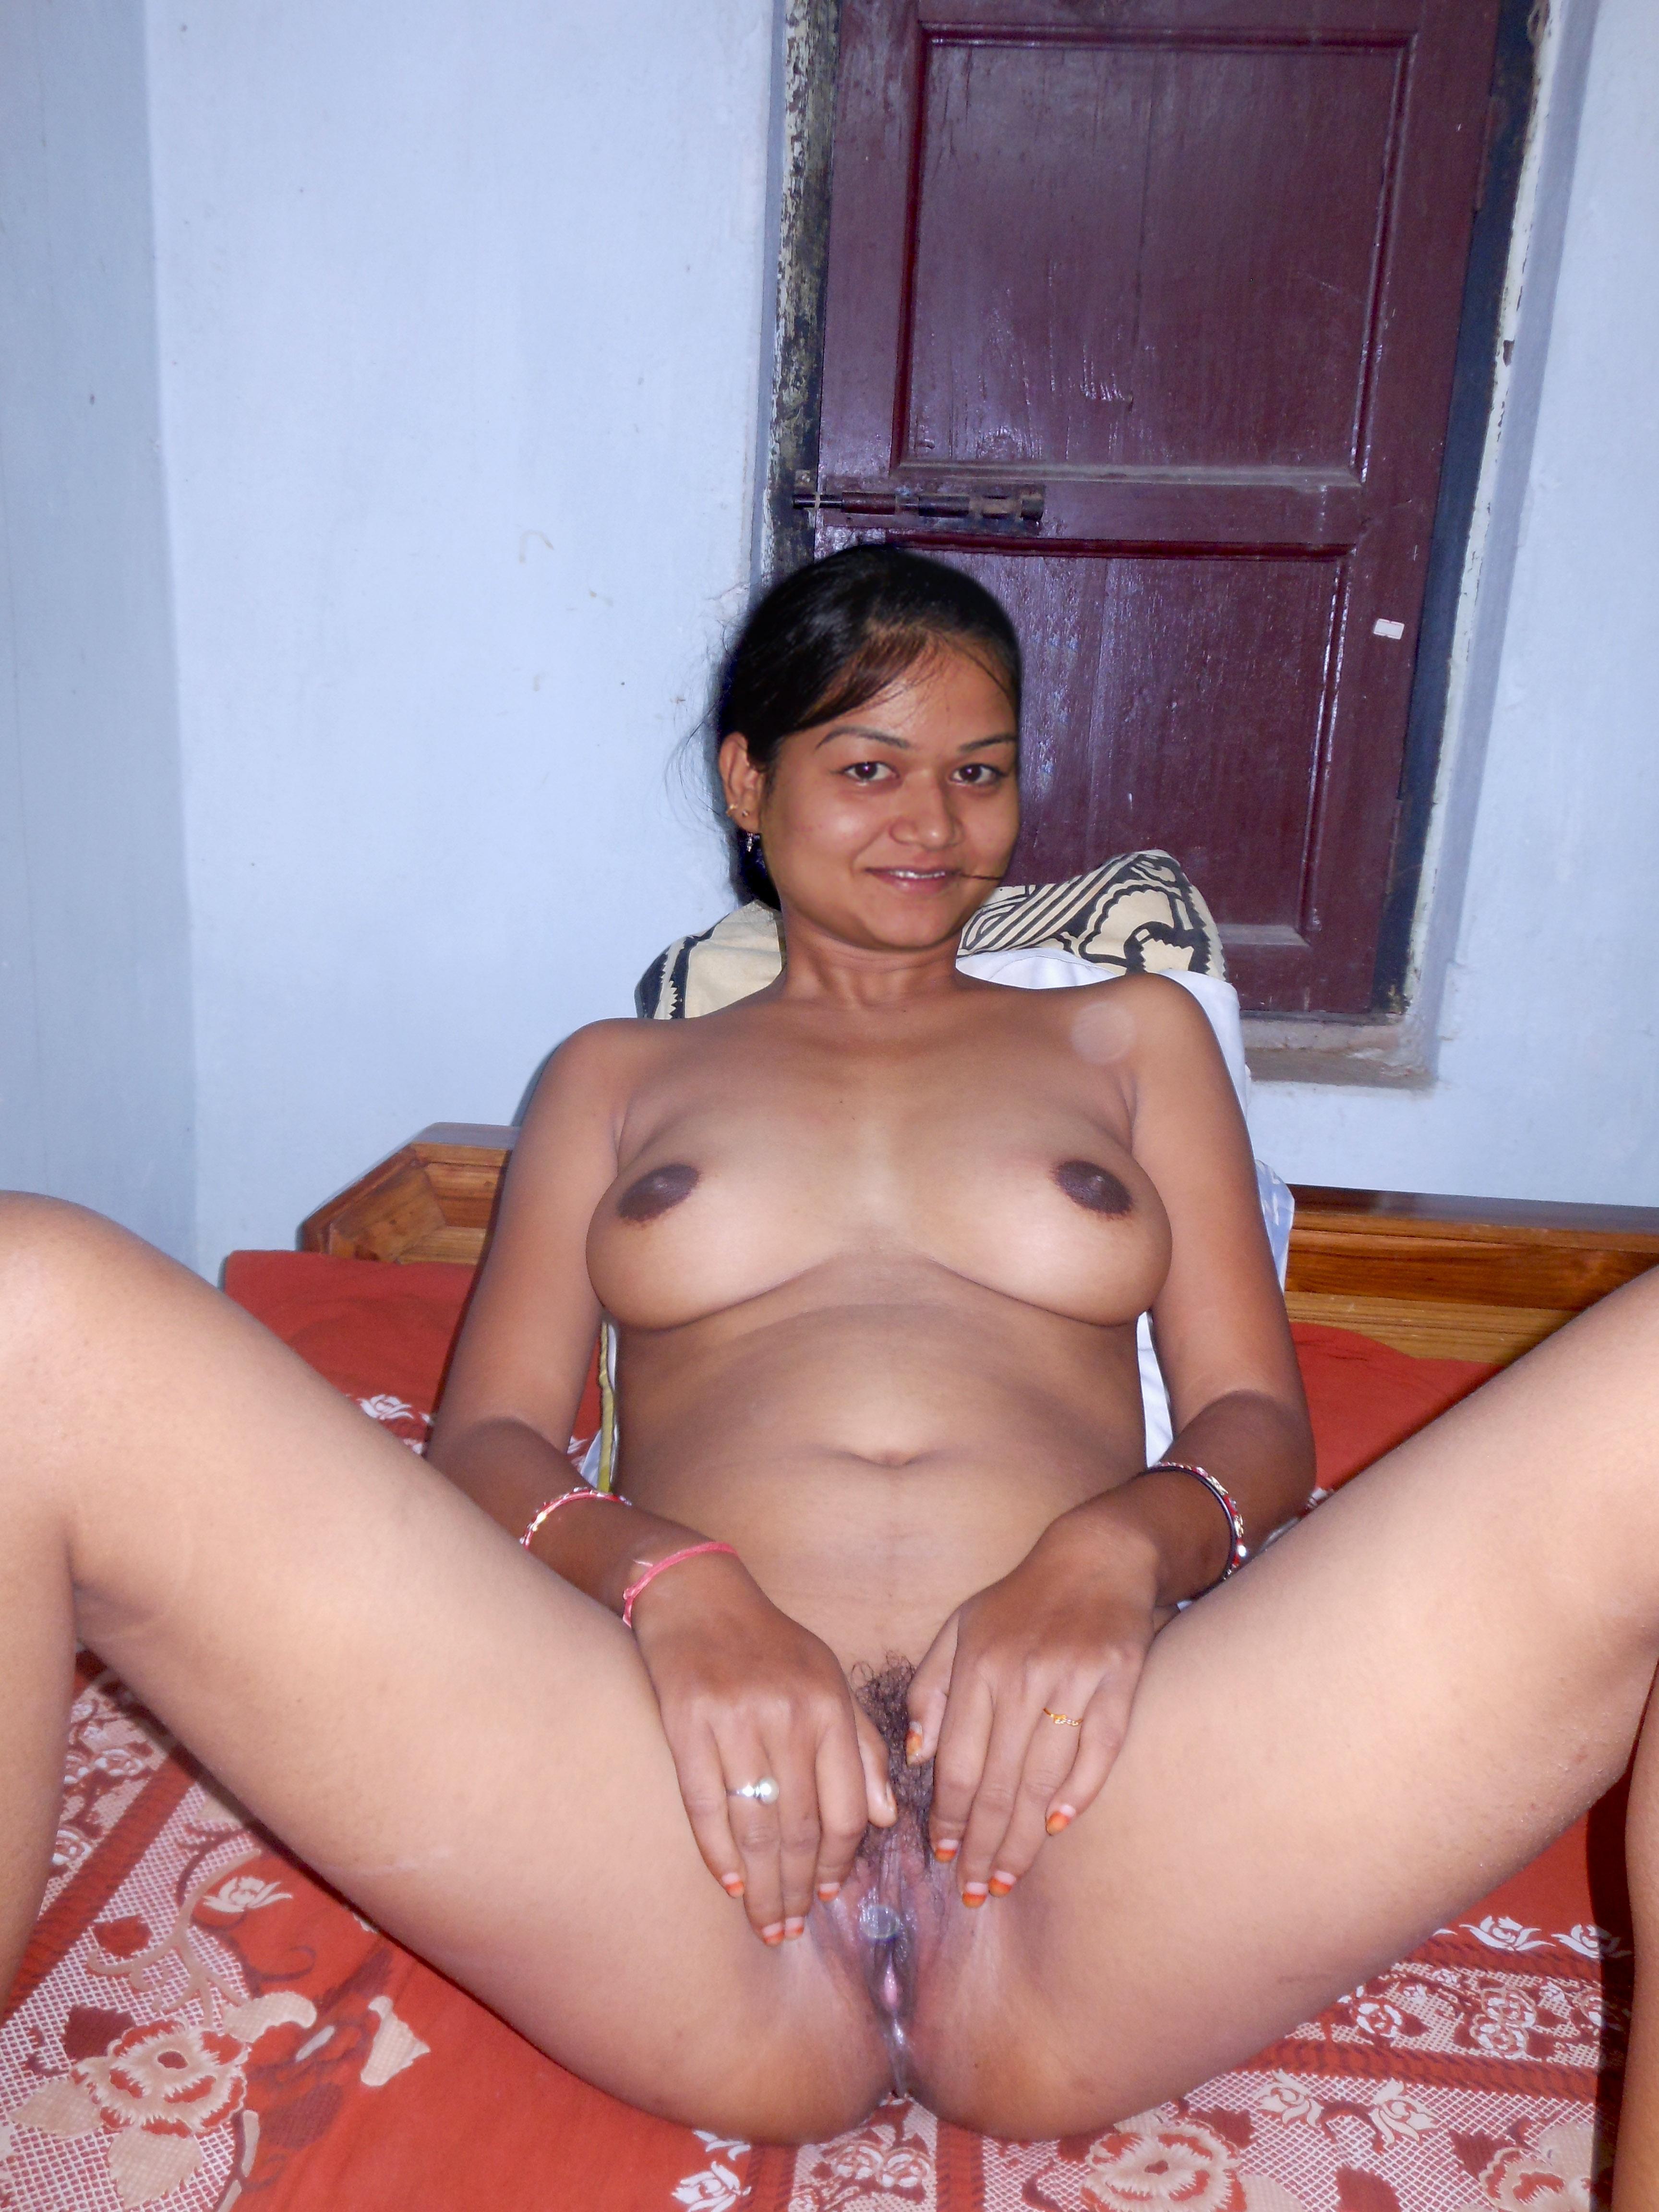 Nepali caregiver porn in israel photo free amateur porn